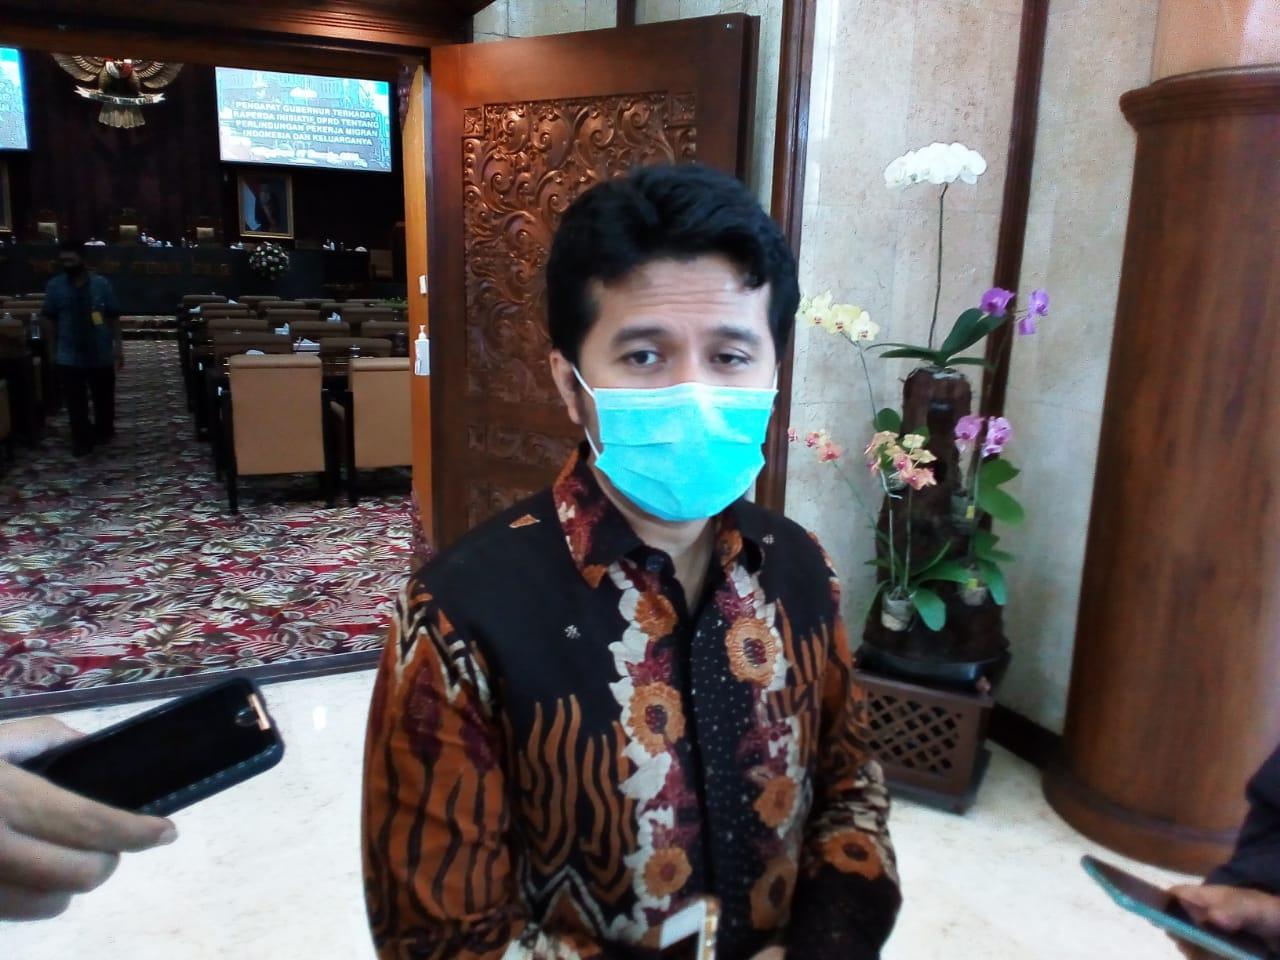 Wakil Gubernur Jatim, Emil Dardak saat ditemui usai rapat paripurna, Kamis (17/12/2020). (Foto: Rangga Aji/Tugu Jatim)